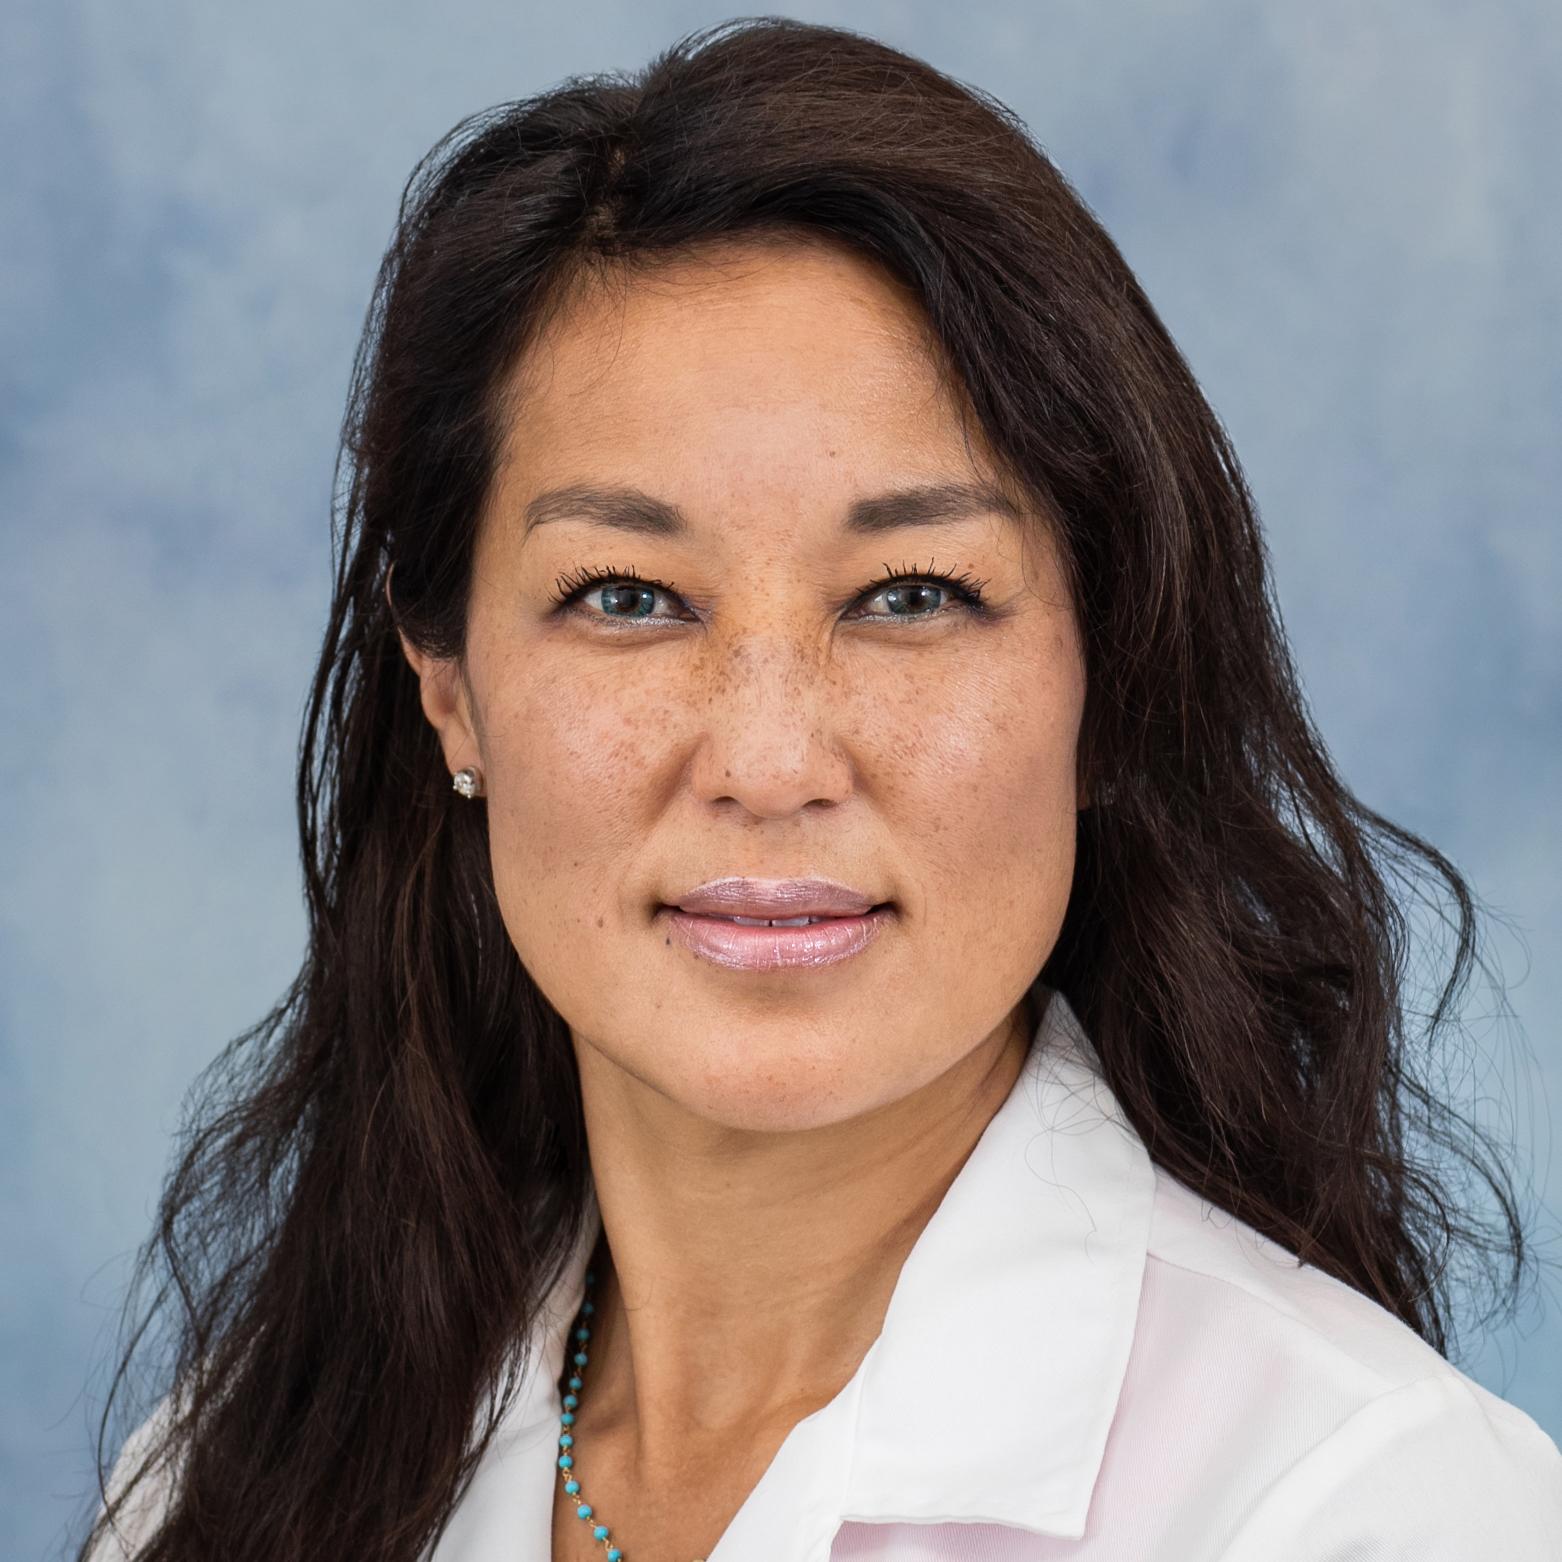 Dr Janelle Park